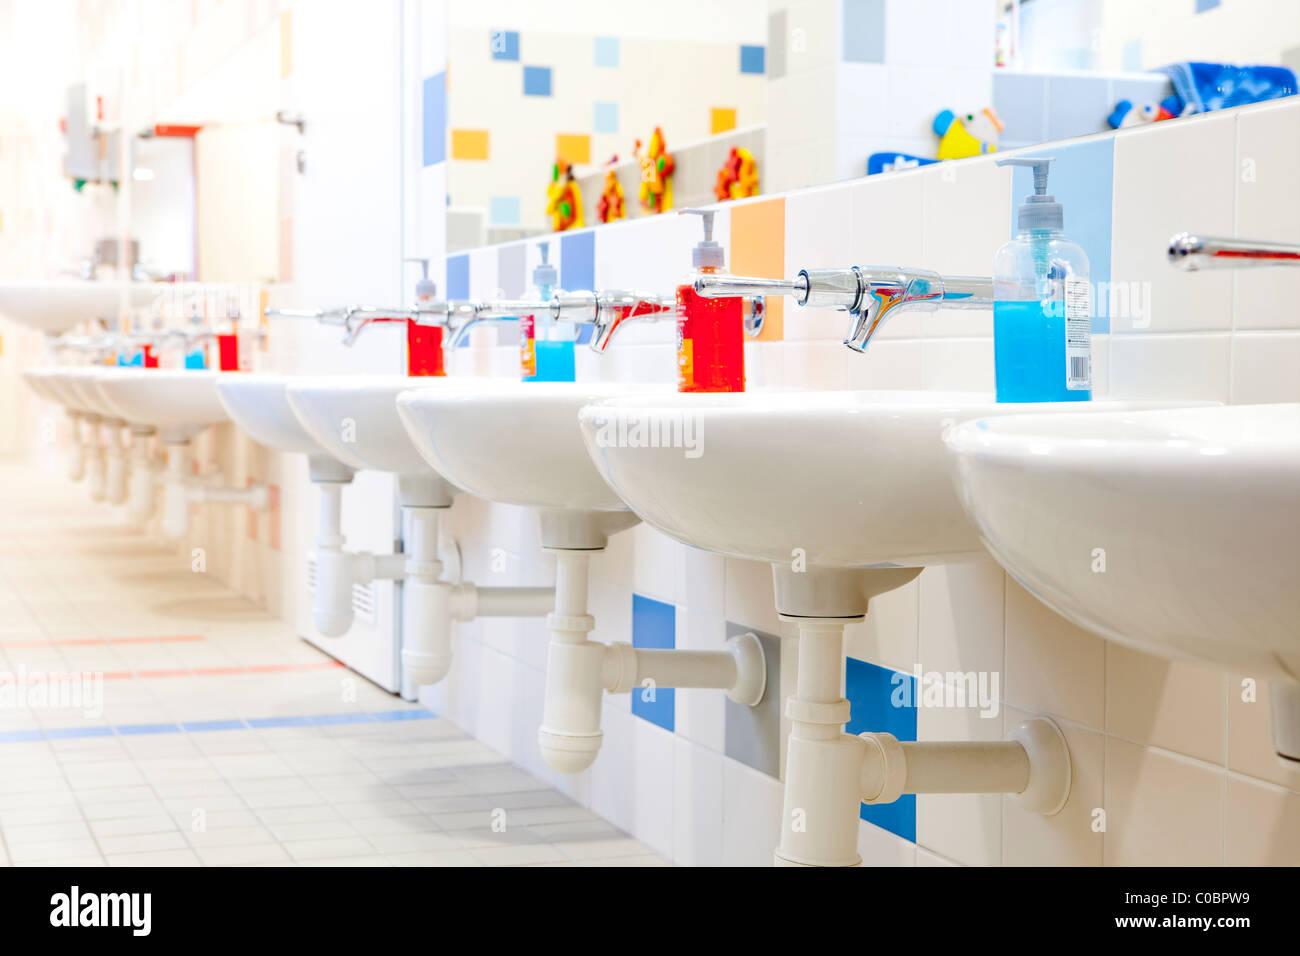 czech republic, prague - interior of modern bathroom in kindergarten - Stock Image